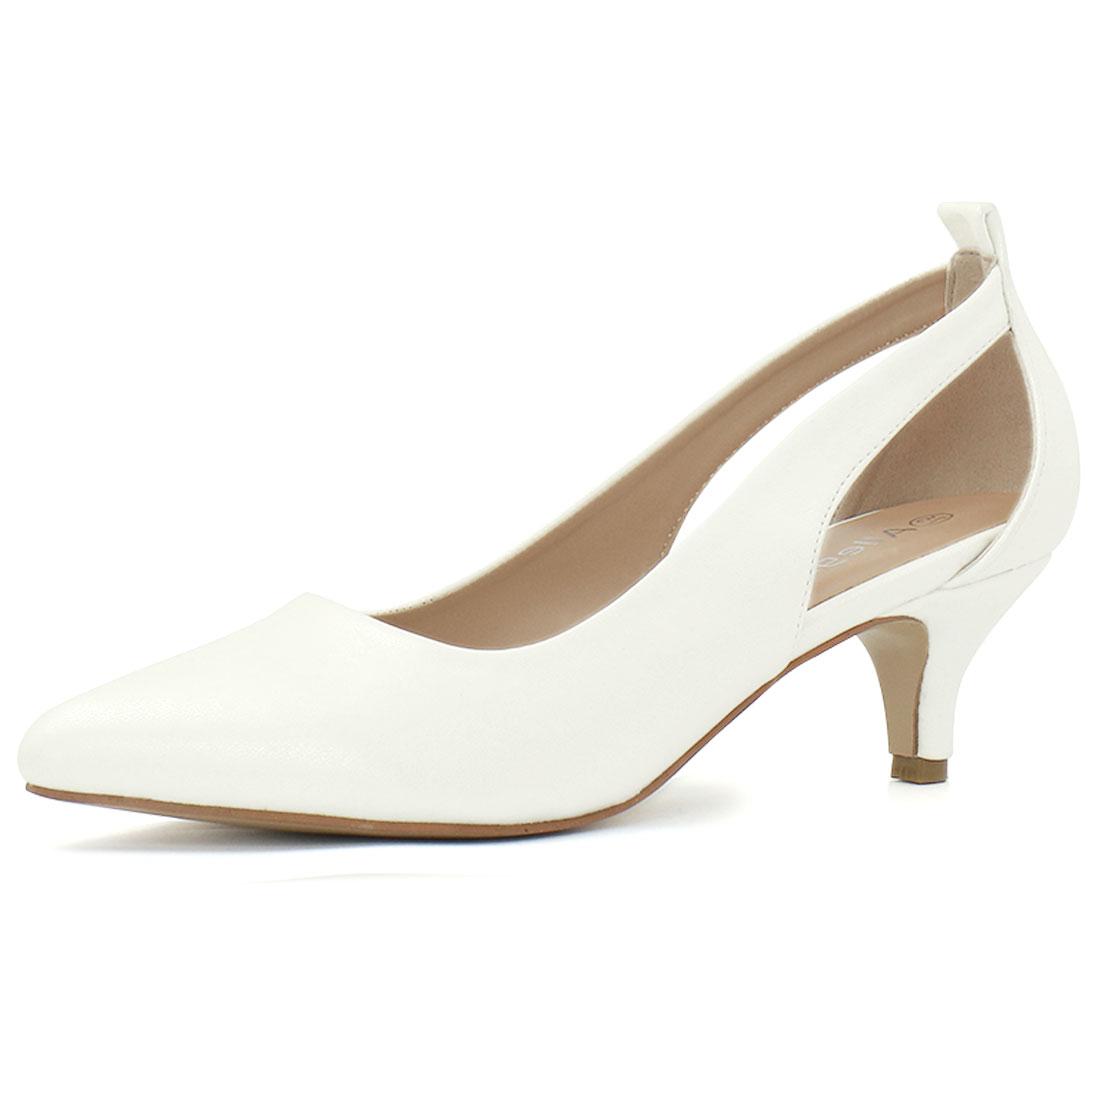 Allegra K Women's Cutout Sides Pointed Toe Kitten Heel Pumps White US 9